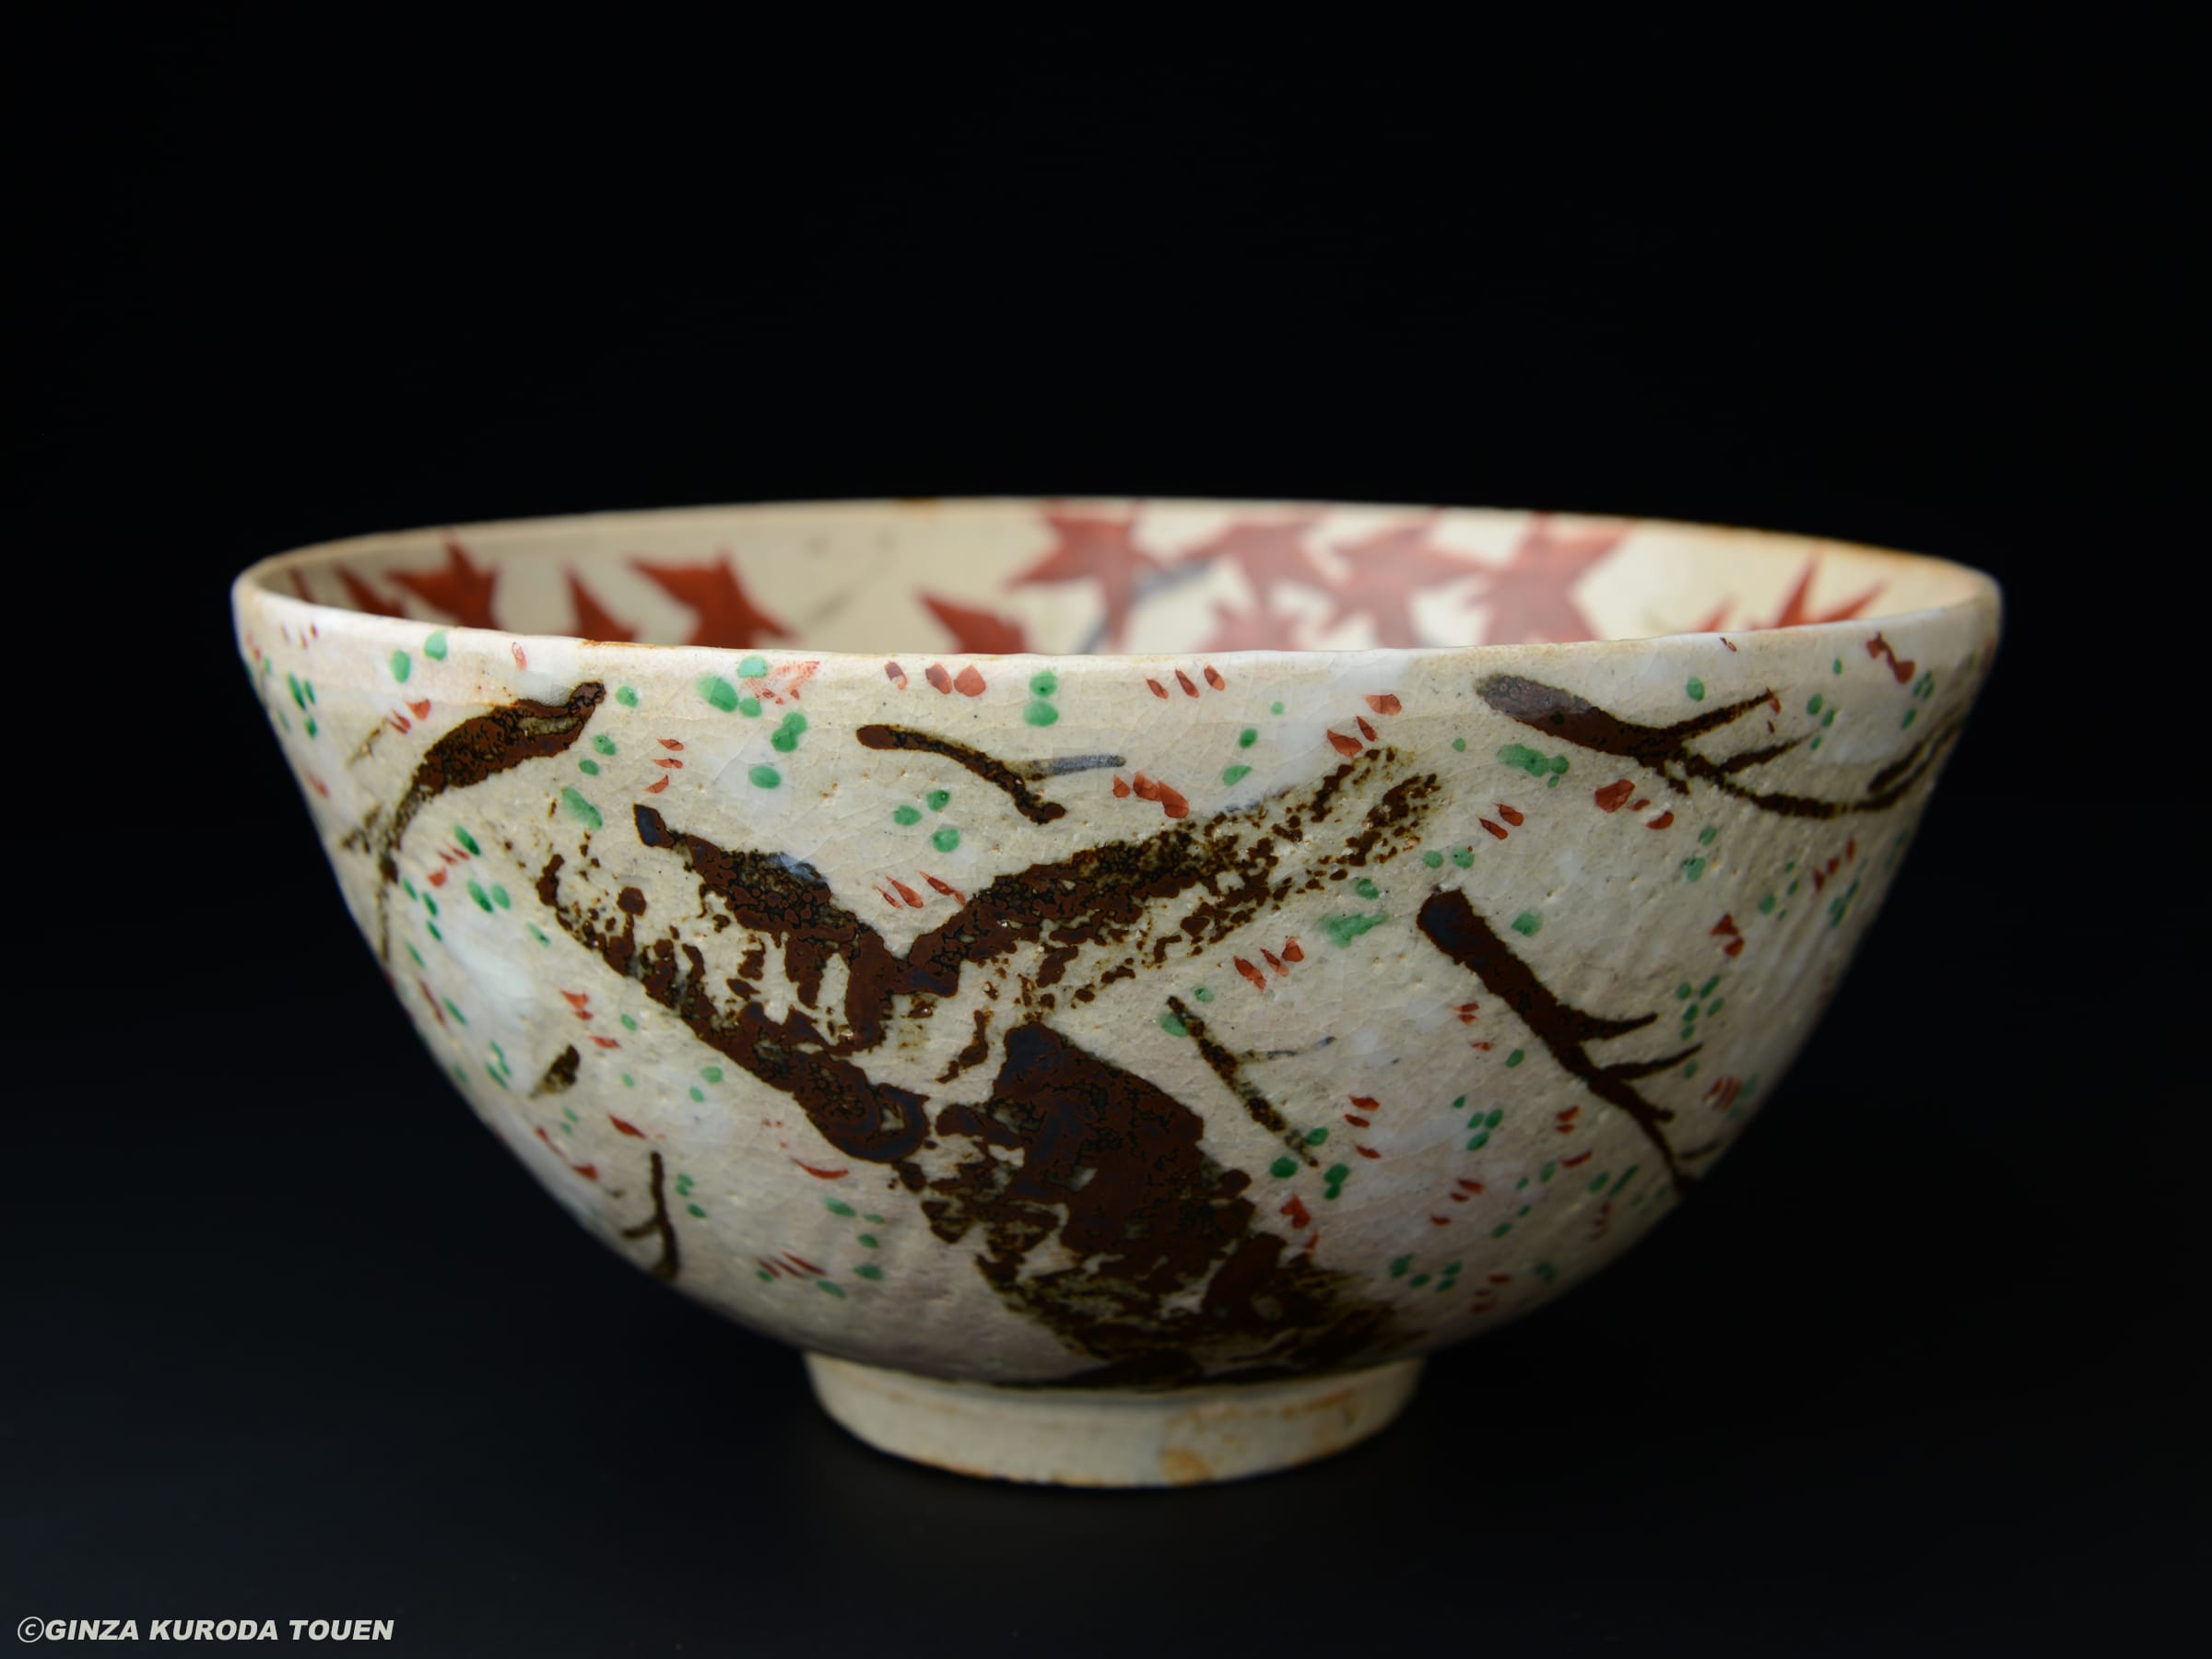 Rosanjin Kitaoji:  Bowl, Unkin - Cherry Blossom and Maple Leaf design